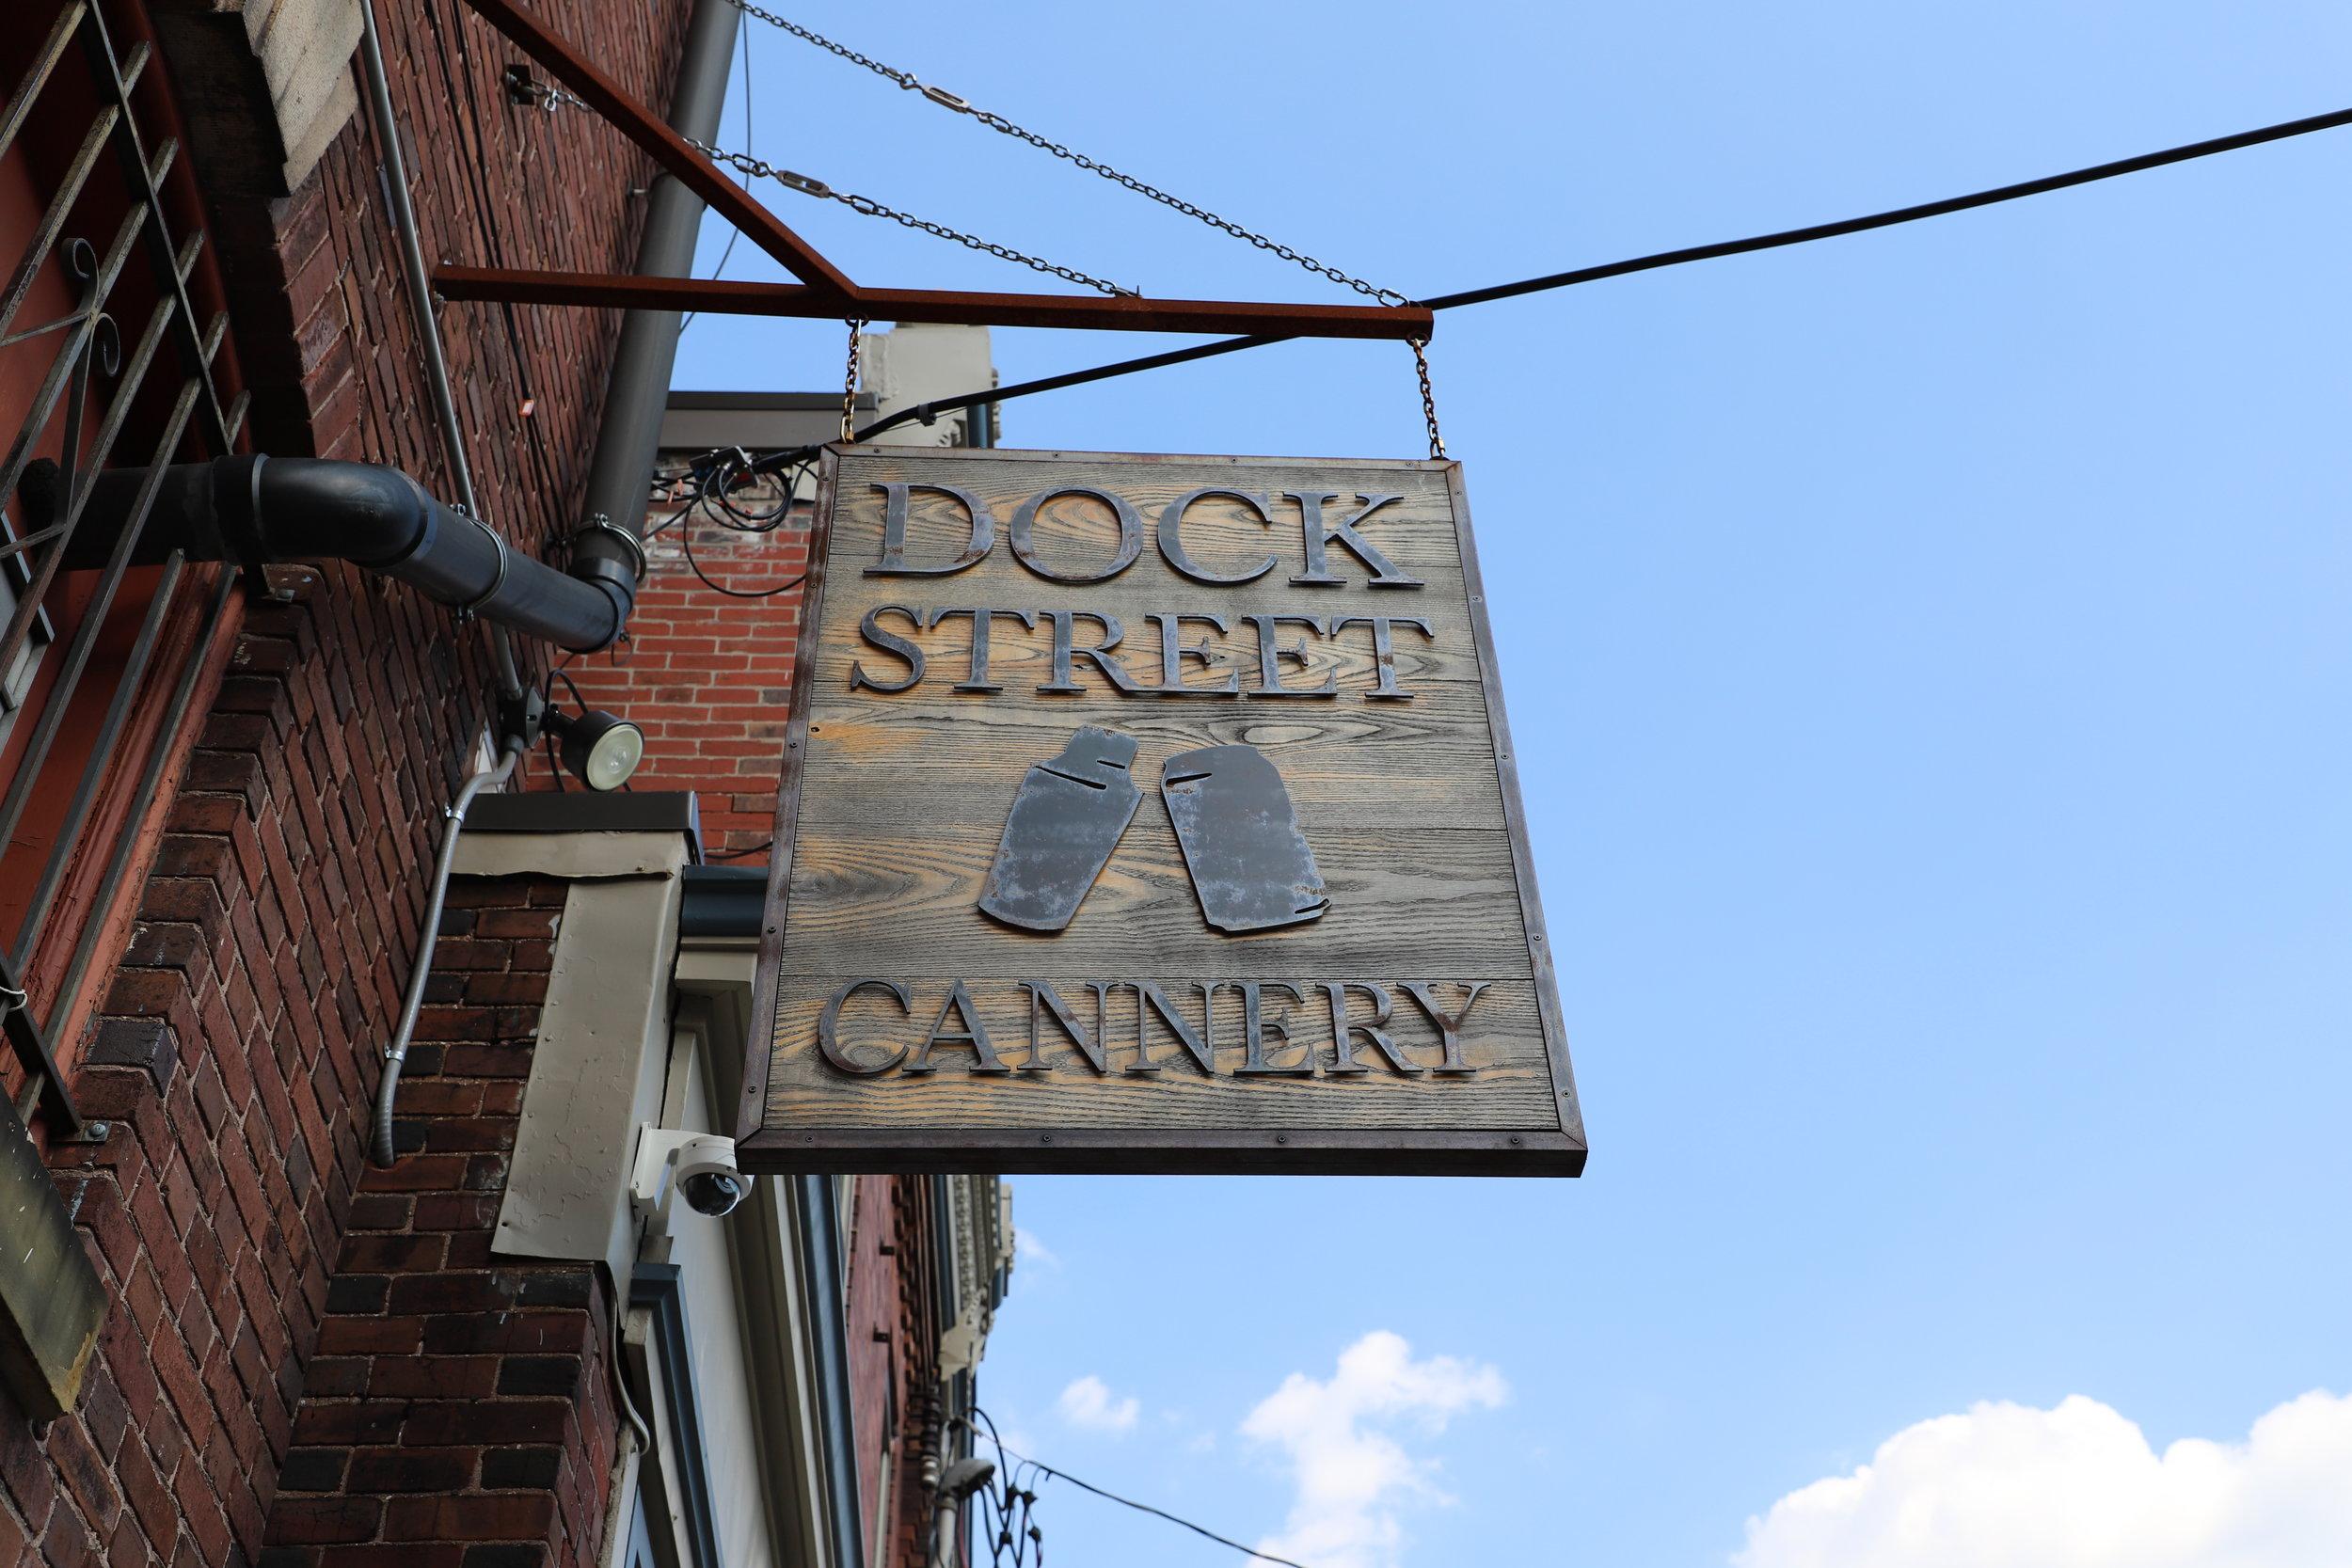 Dock Street Cannery.JPG